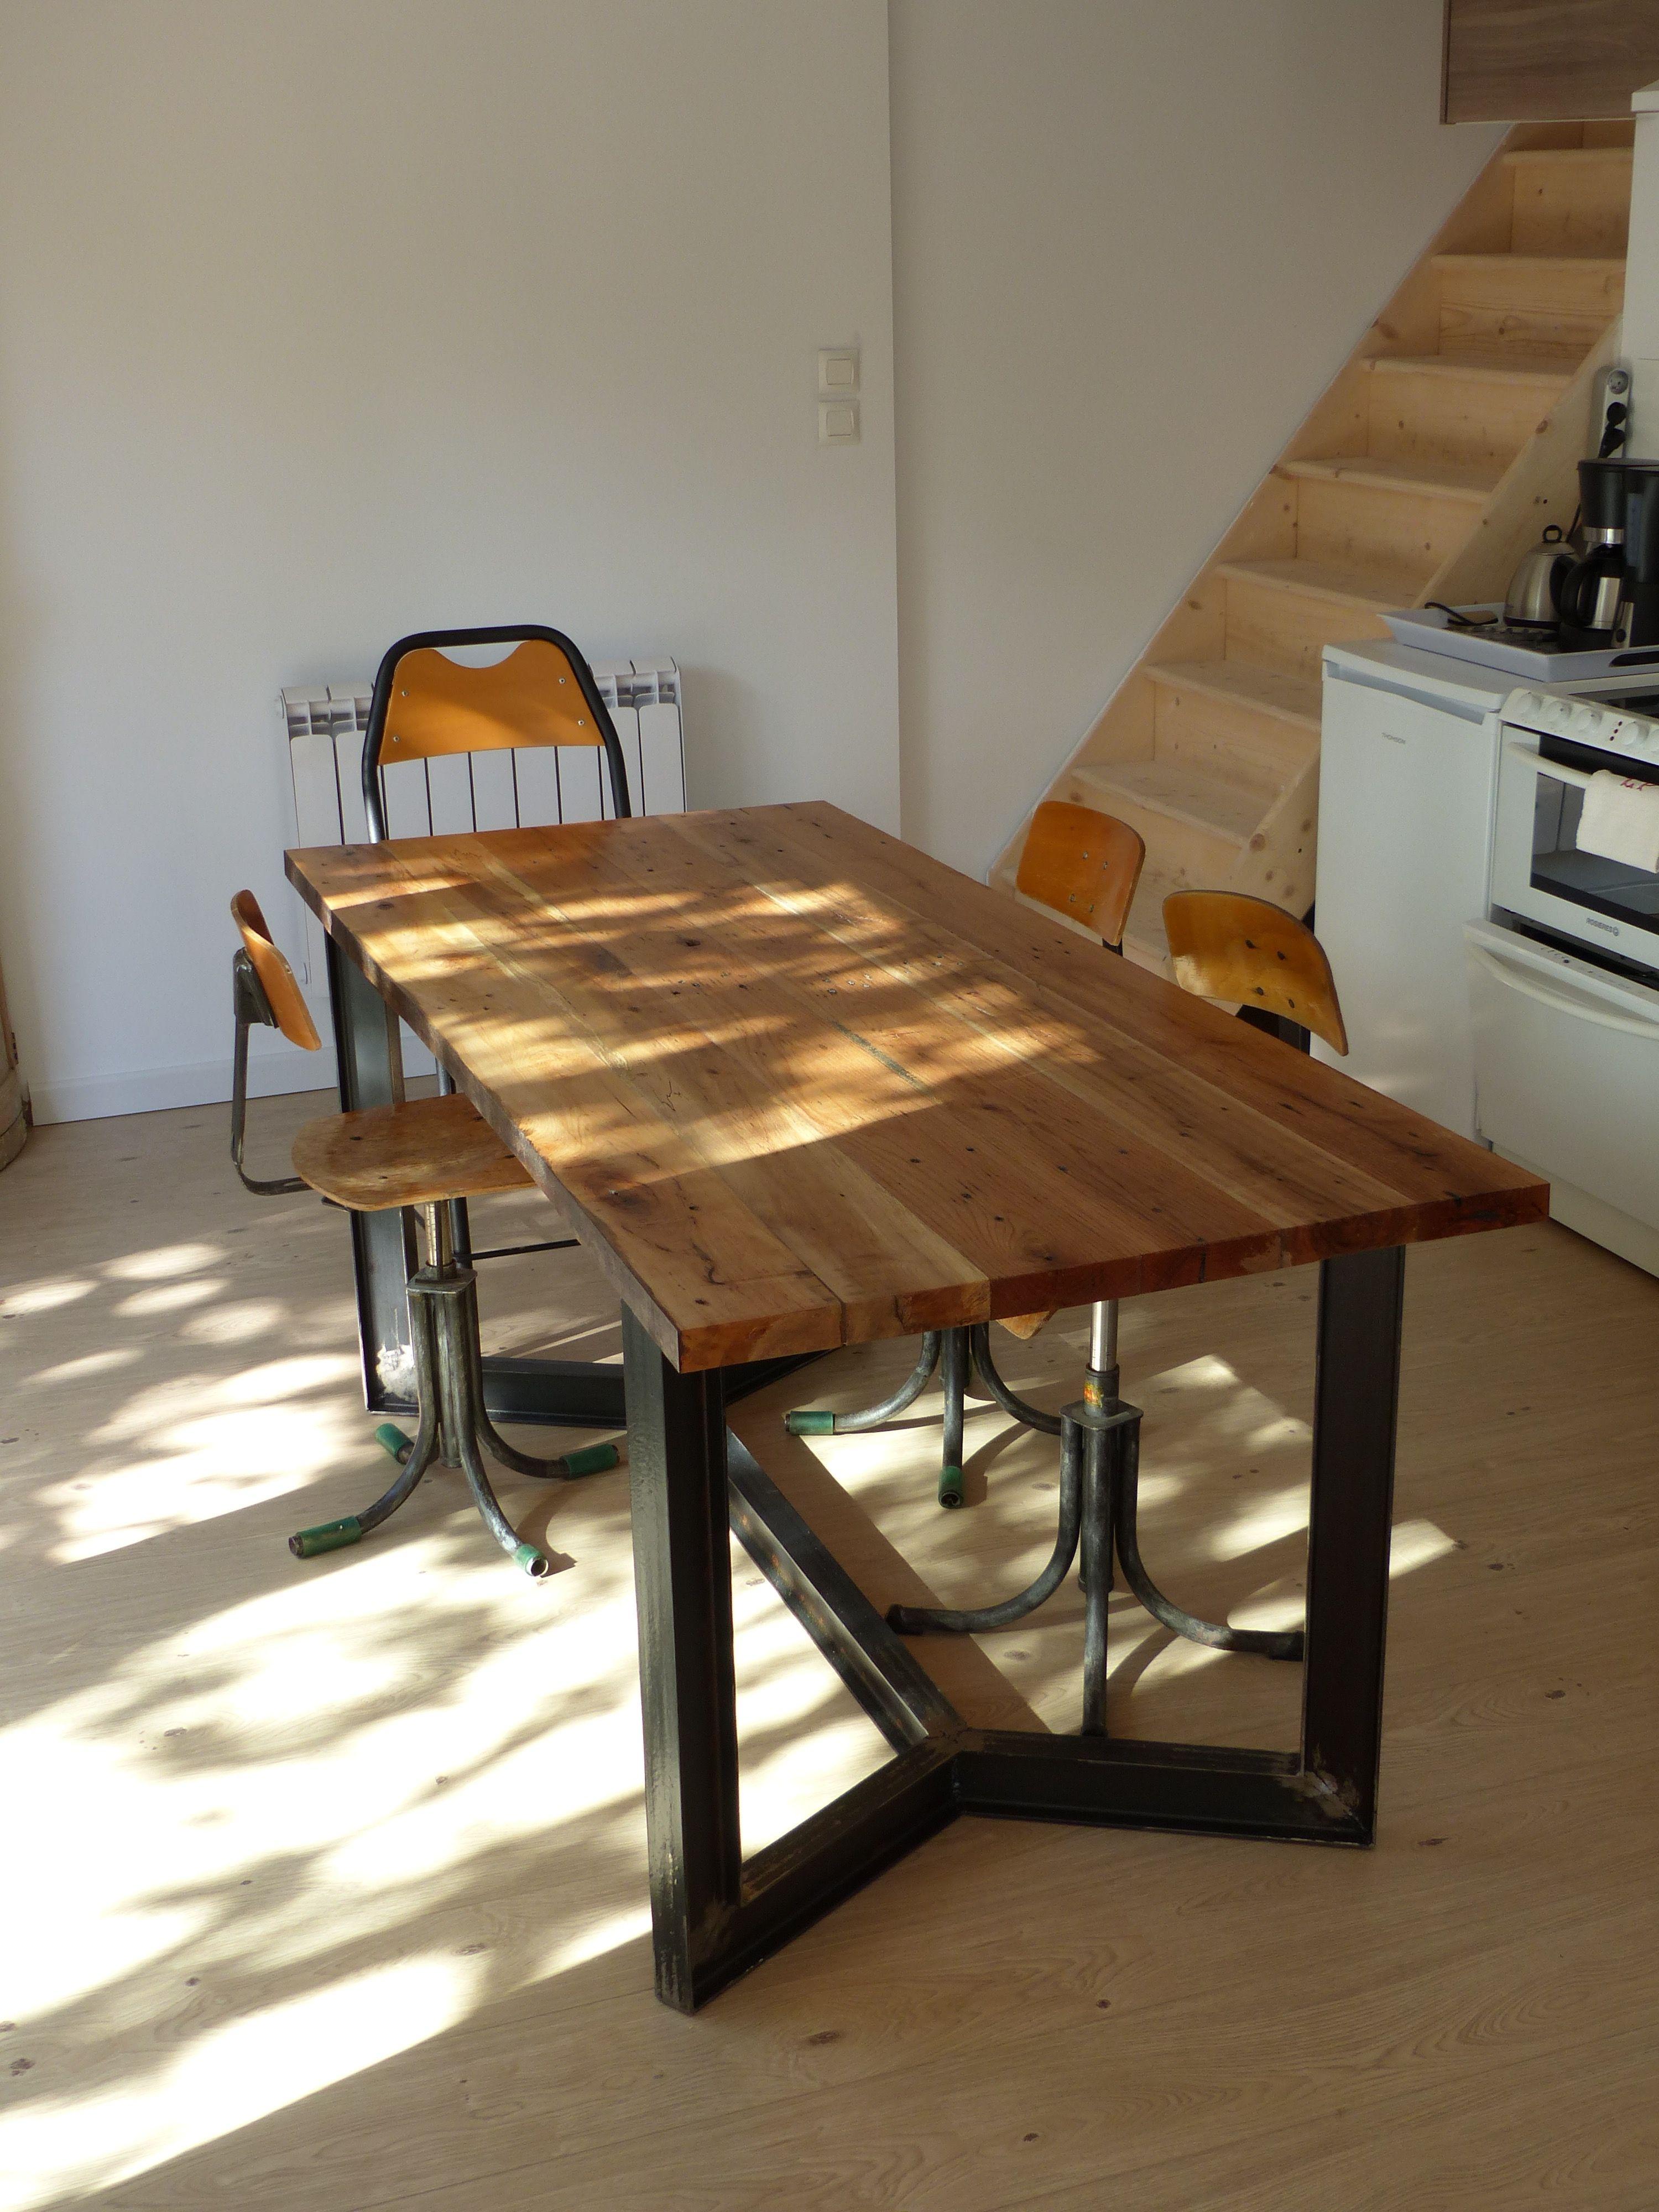 Table Repas /// Dinner Table Bois Palette U0026 IPN Métal Reclaimed Wood